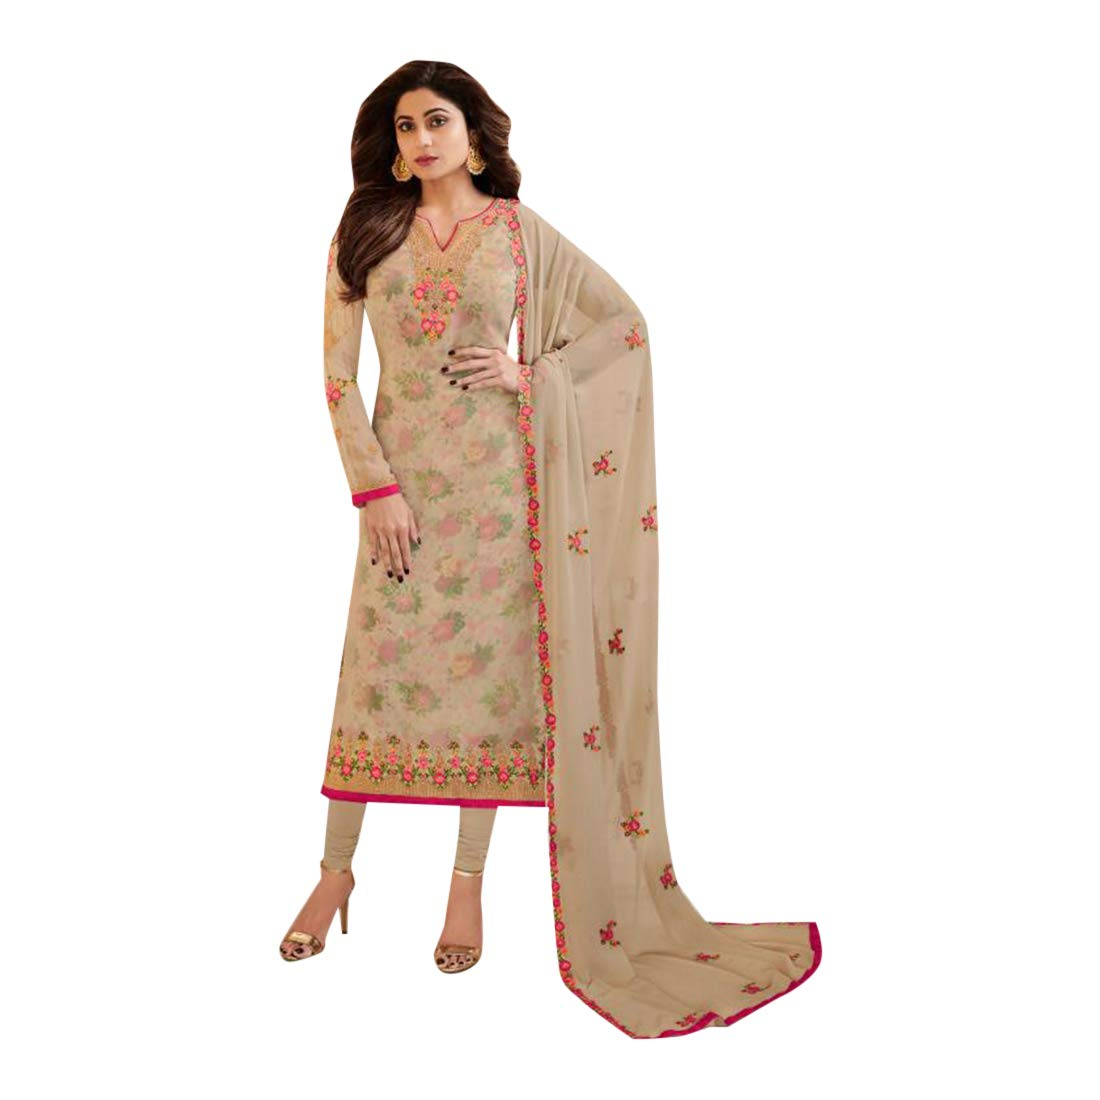 Beige SHRI BALAJI SILK & COTTON SAREE EMPORIUM Indian Ethnic Long Hindu Muslim Straight Salwar Kameez Suit 7398